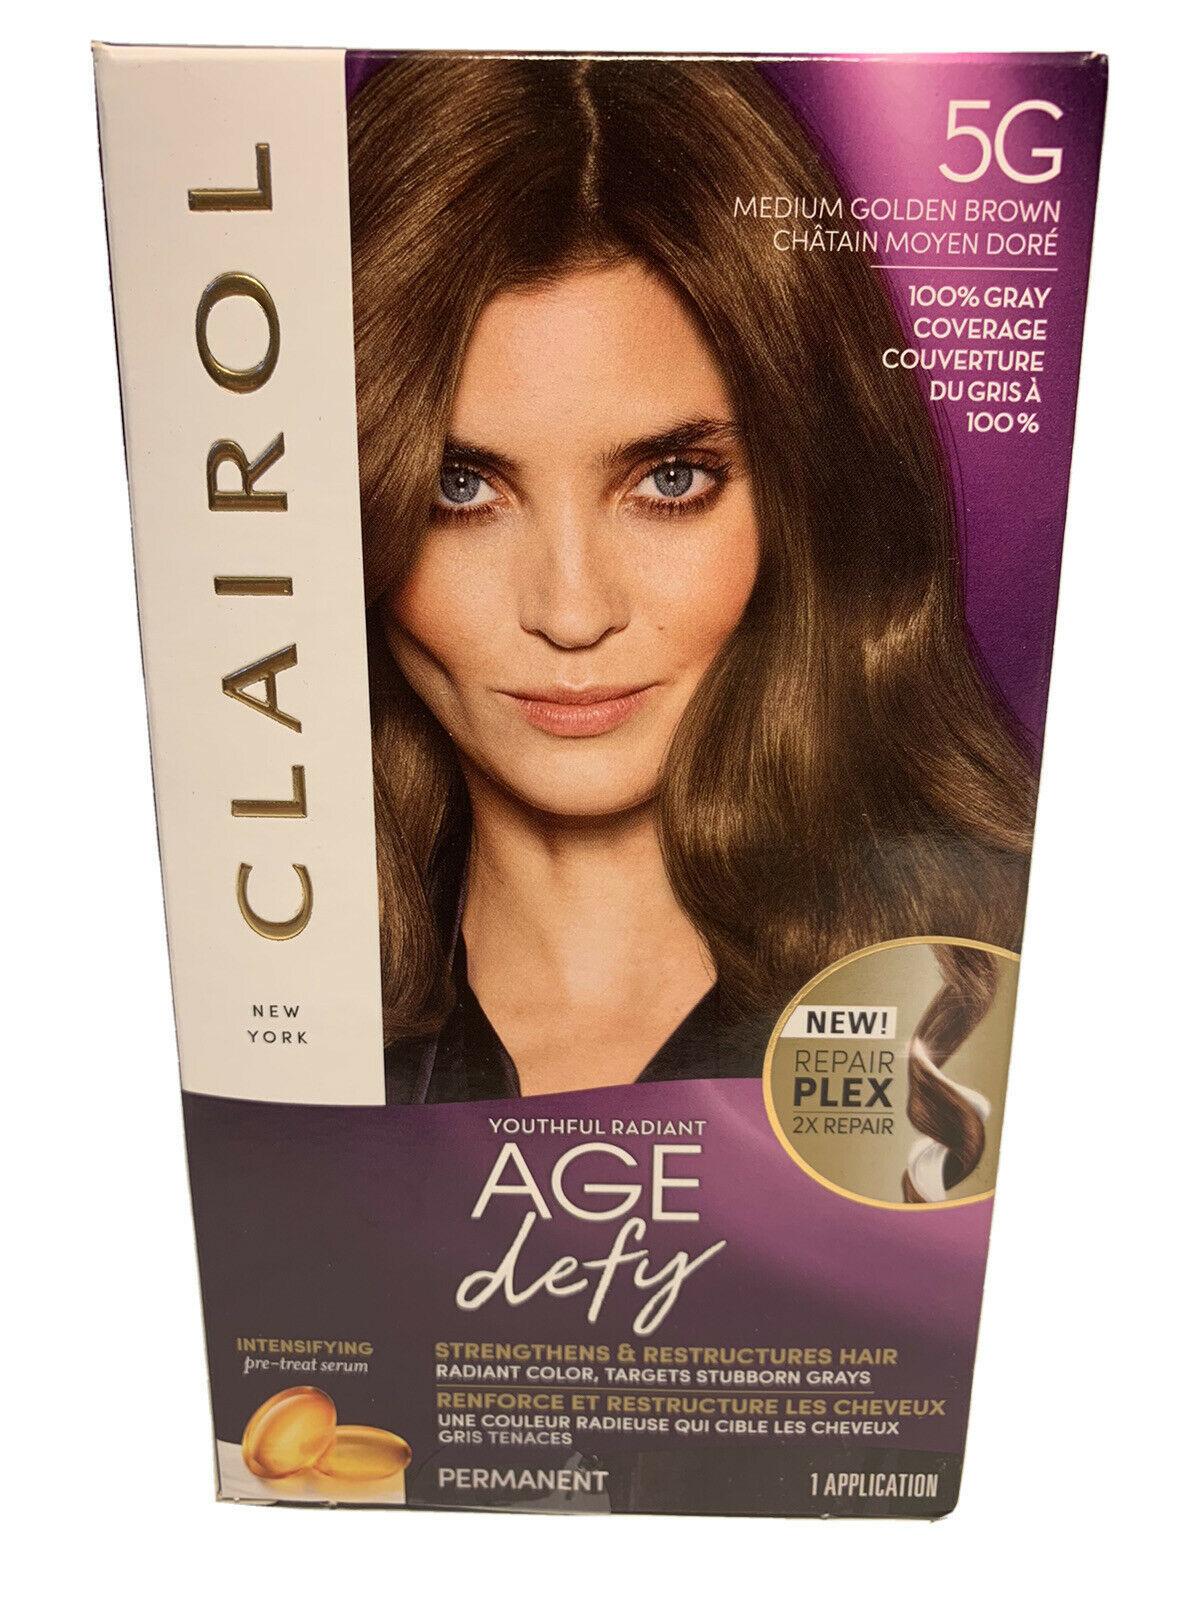 CLAIROL Youthful Radiant Age Defy Permanent 5G Medium Golden Brown hair dye - $12.86